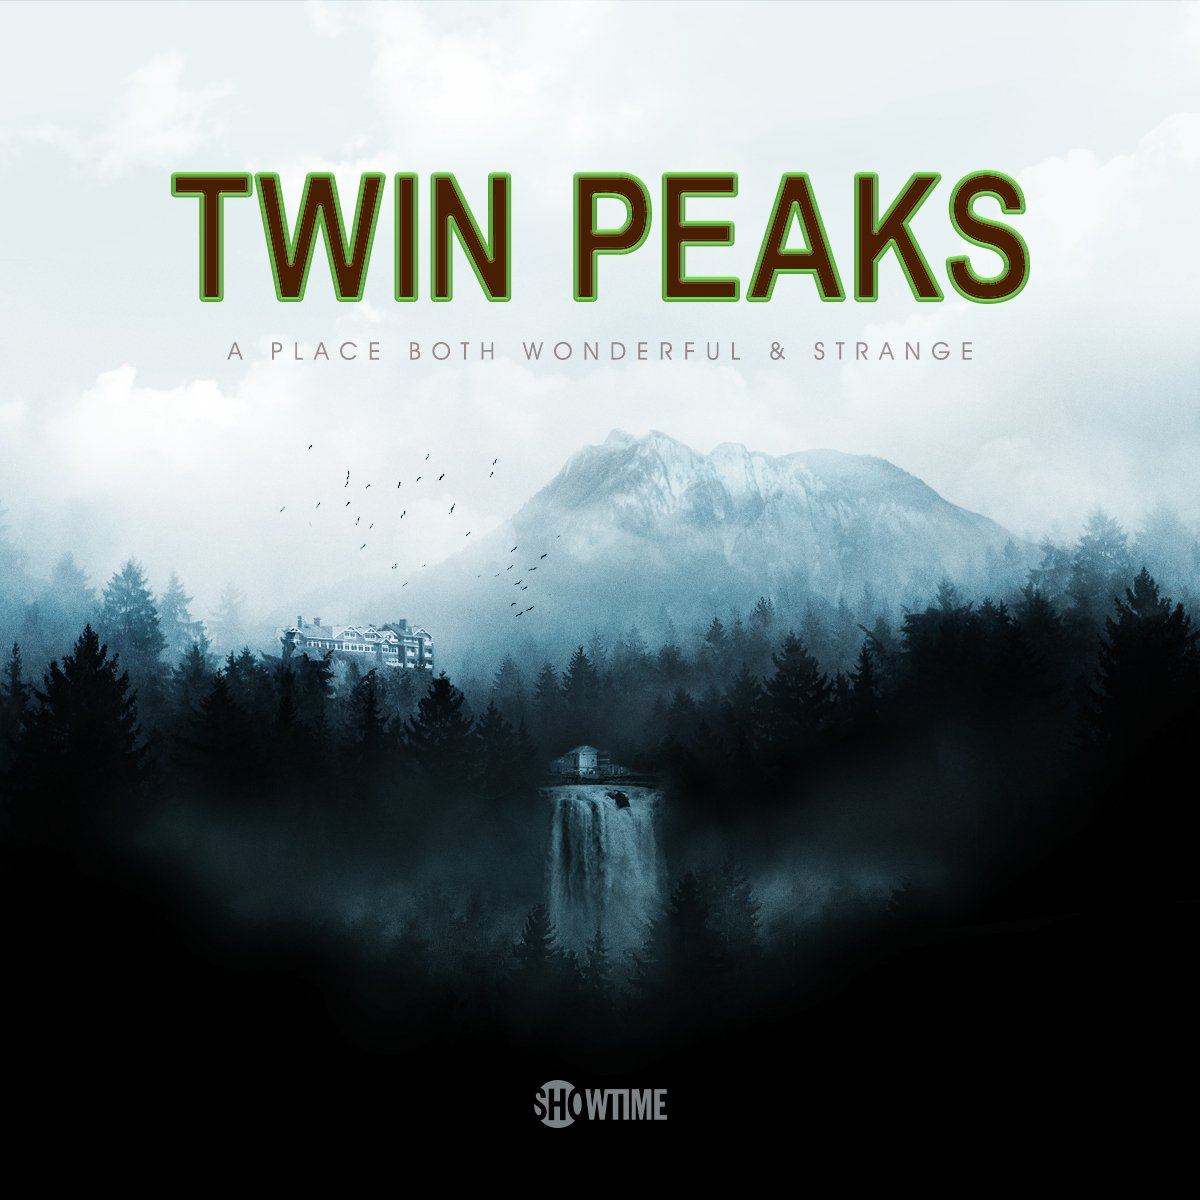 10012017_twin_peaks_2017_post_2